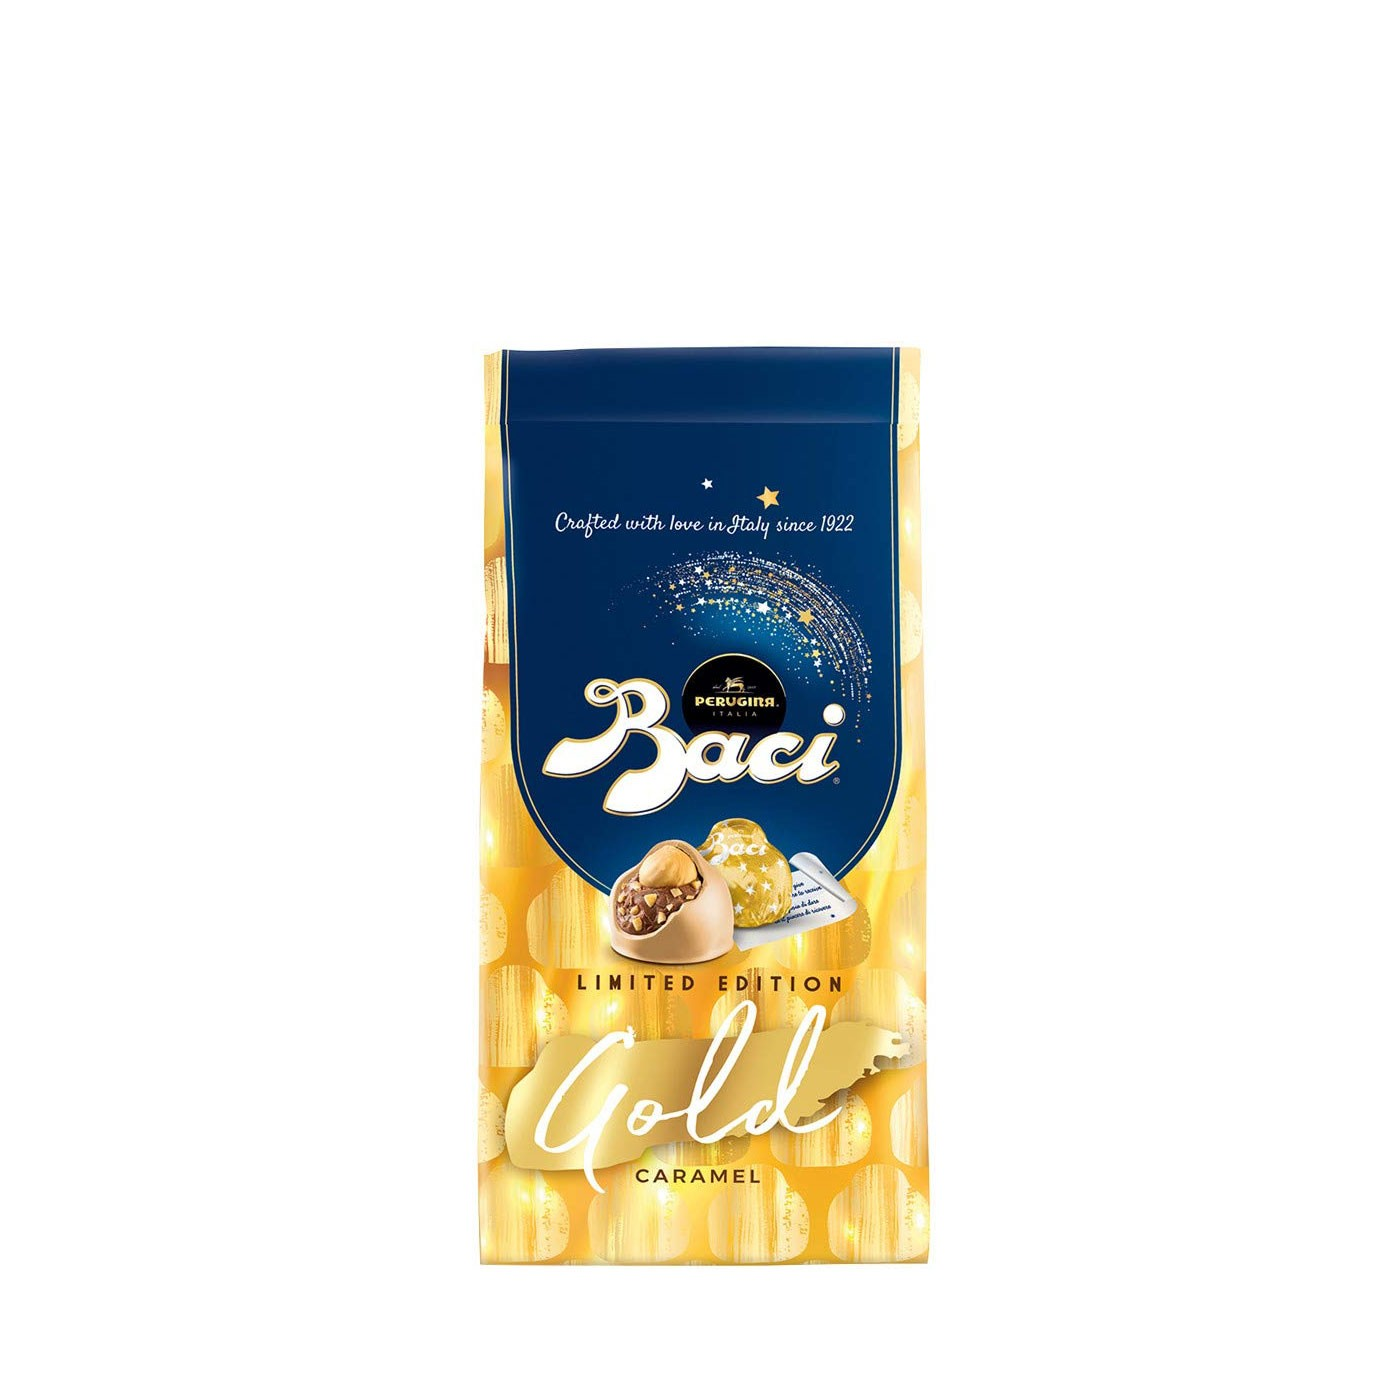 Caramel Gold Baci Bag 3.9 oz  - Perugina | Eataly.com